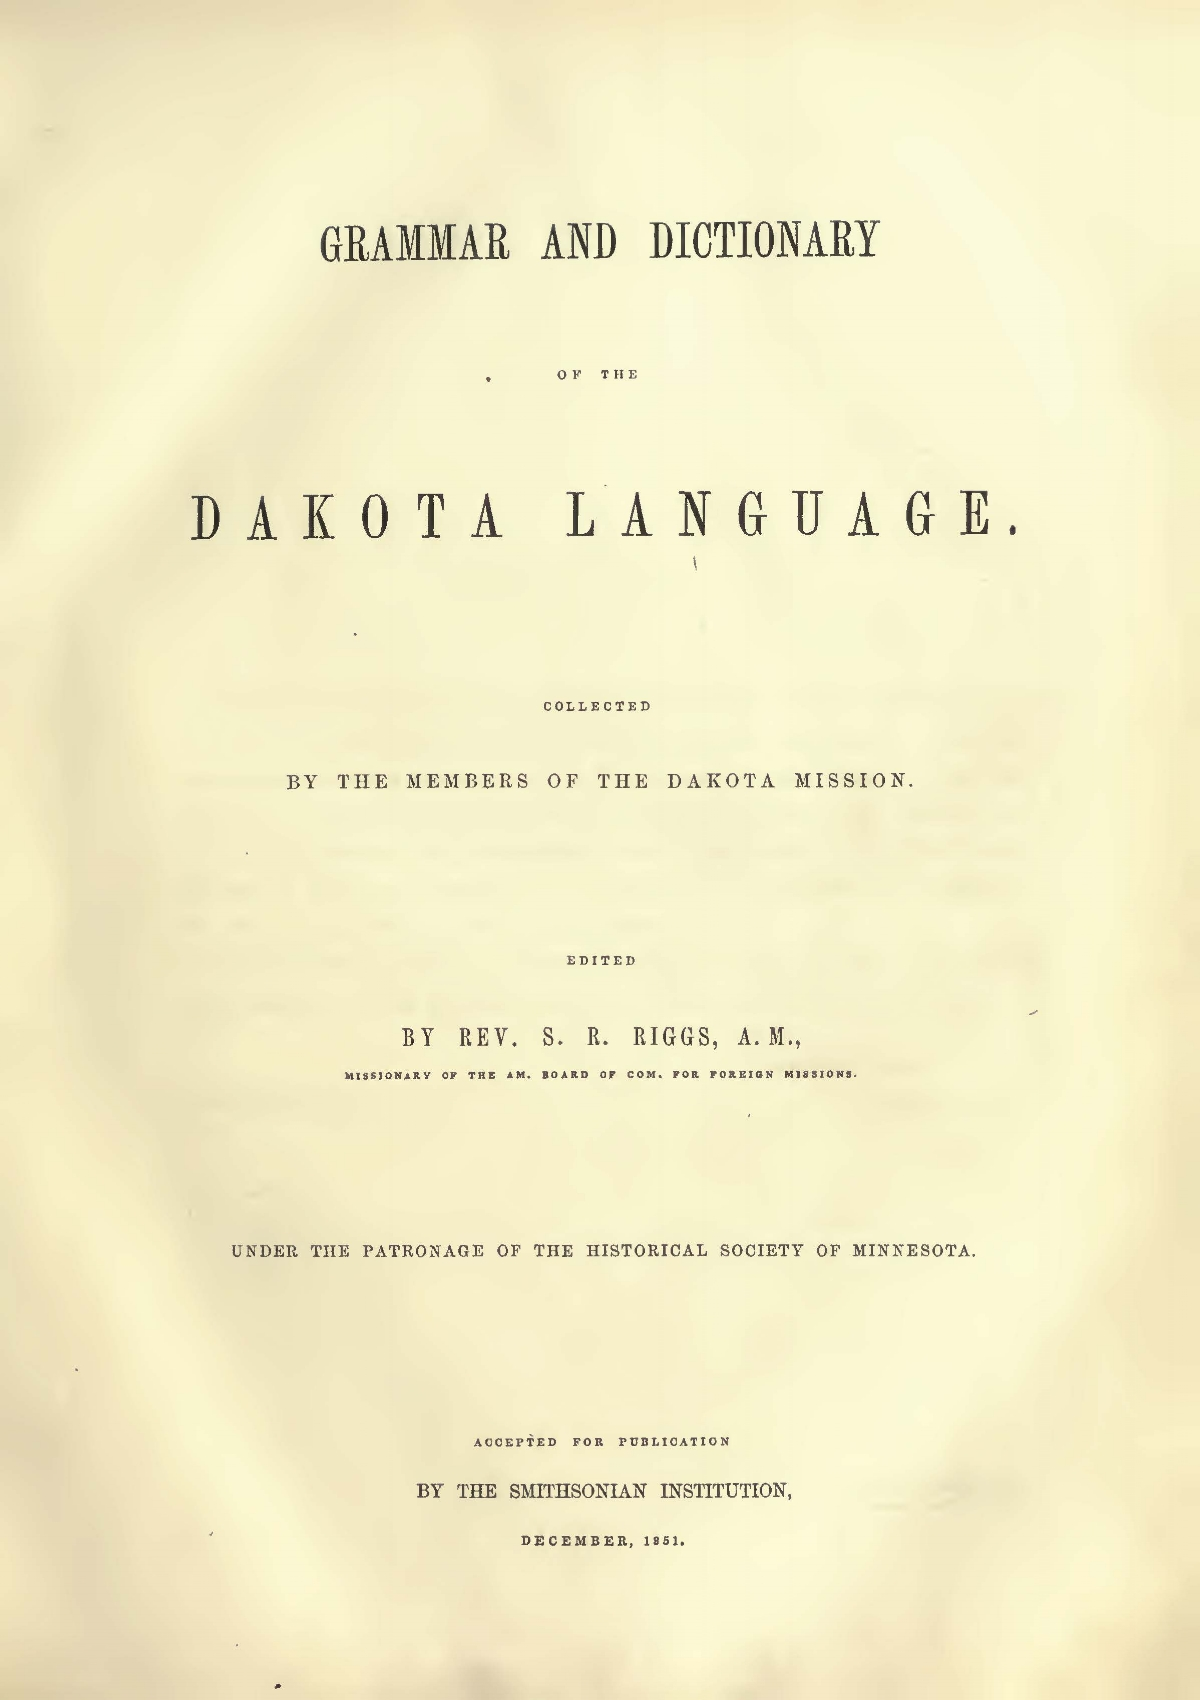 Riggs, Stephen Return, Grammar and Dictionary of the Dakota Language Title Page.jpg